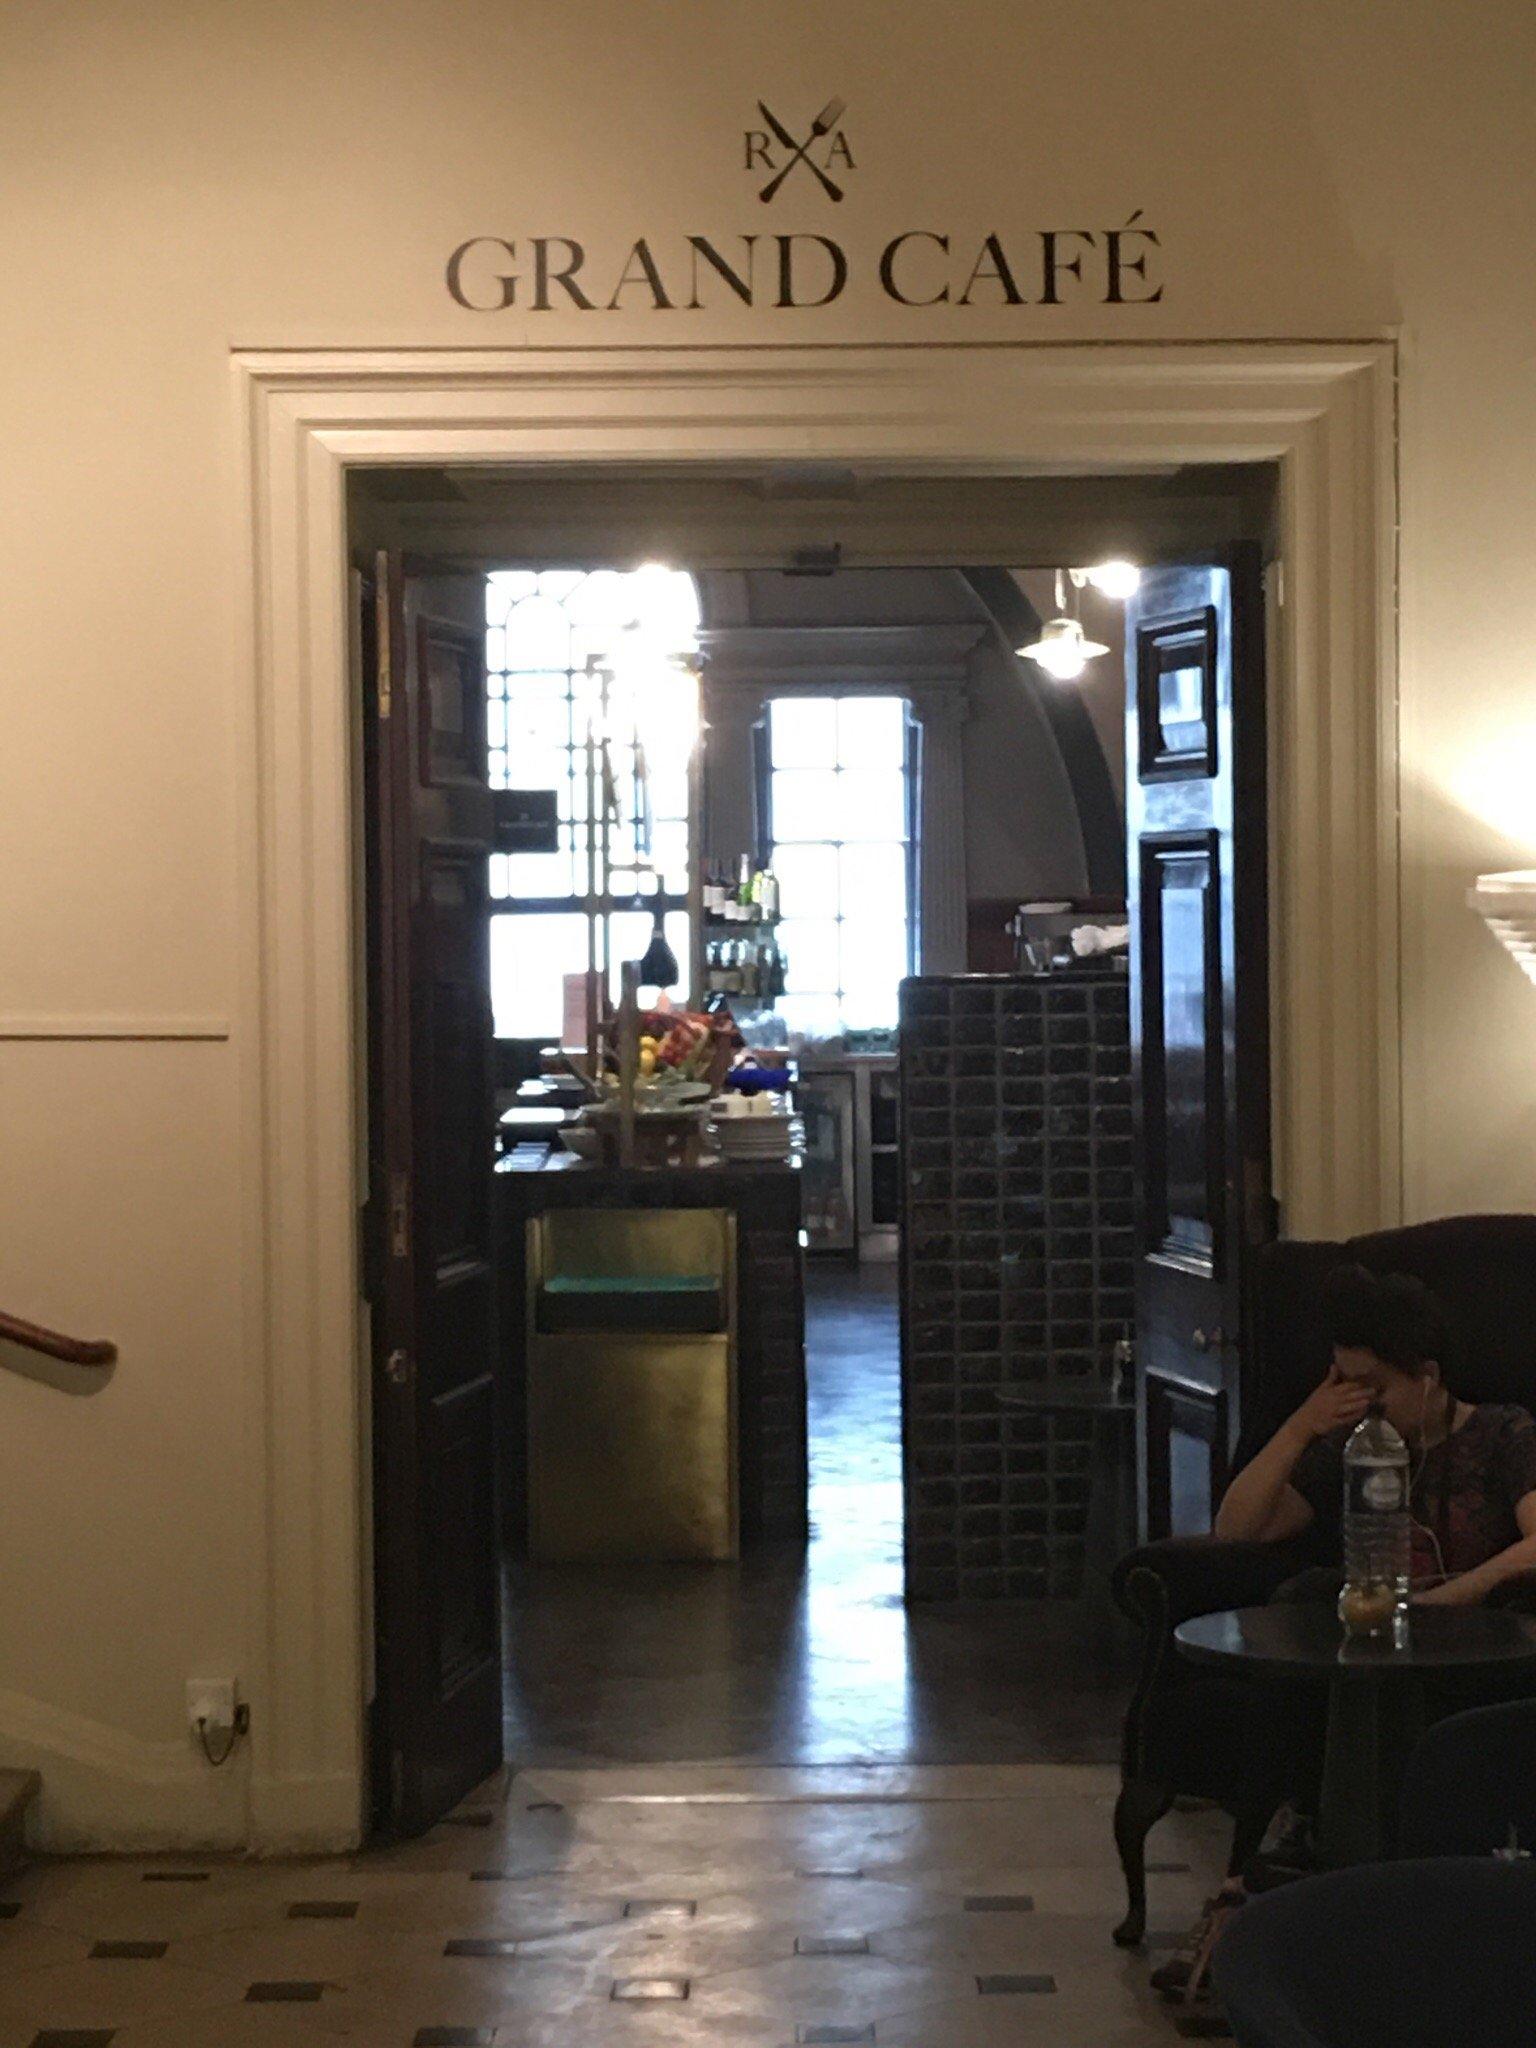 ra grand cafe london mayfair restaurant reviews phone number